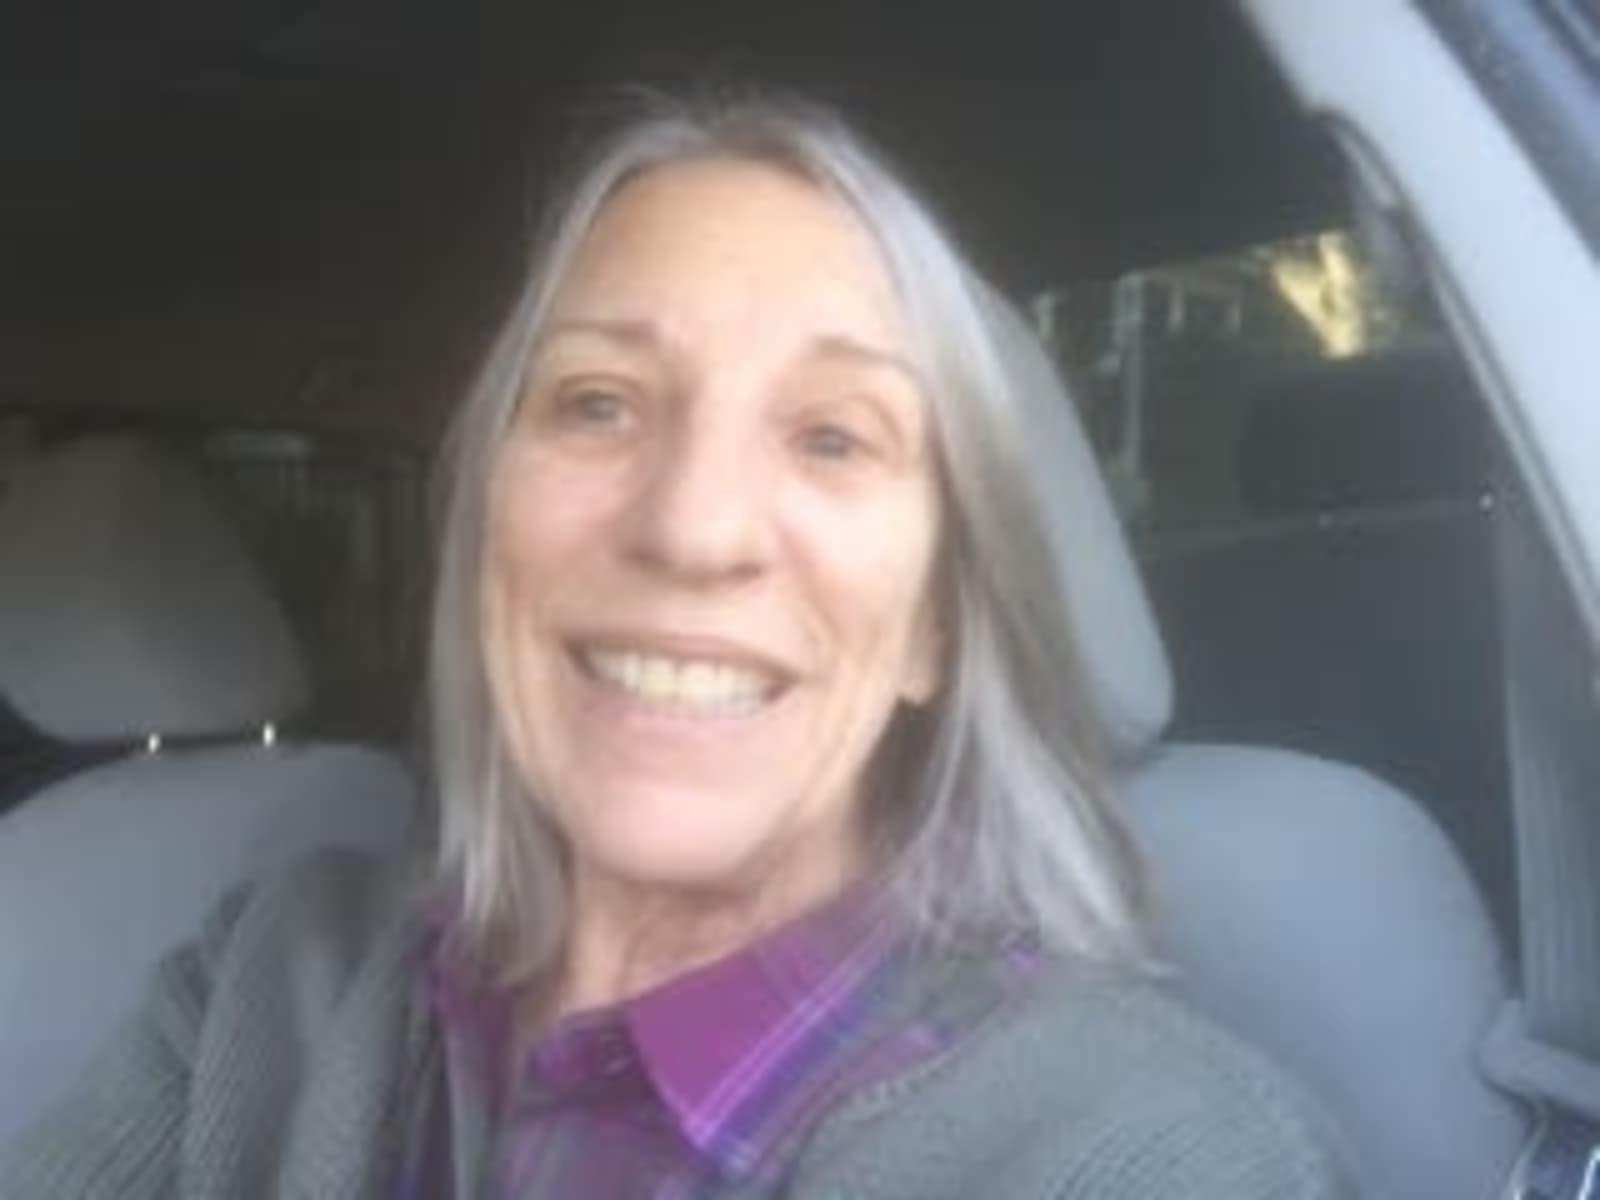 Anita from Sacramento, California, United States